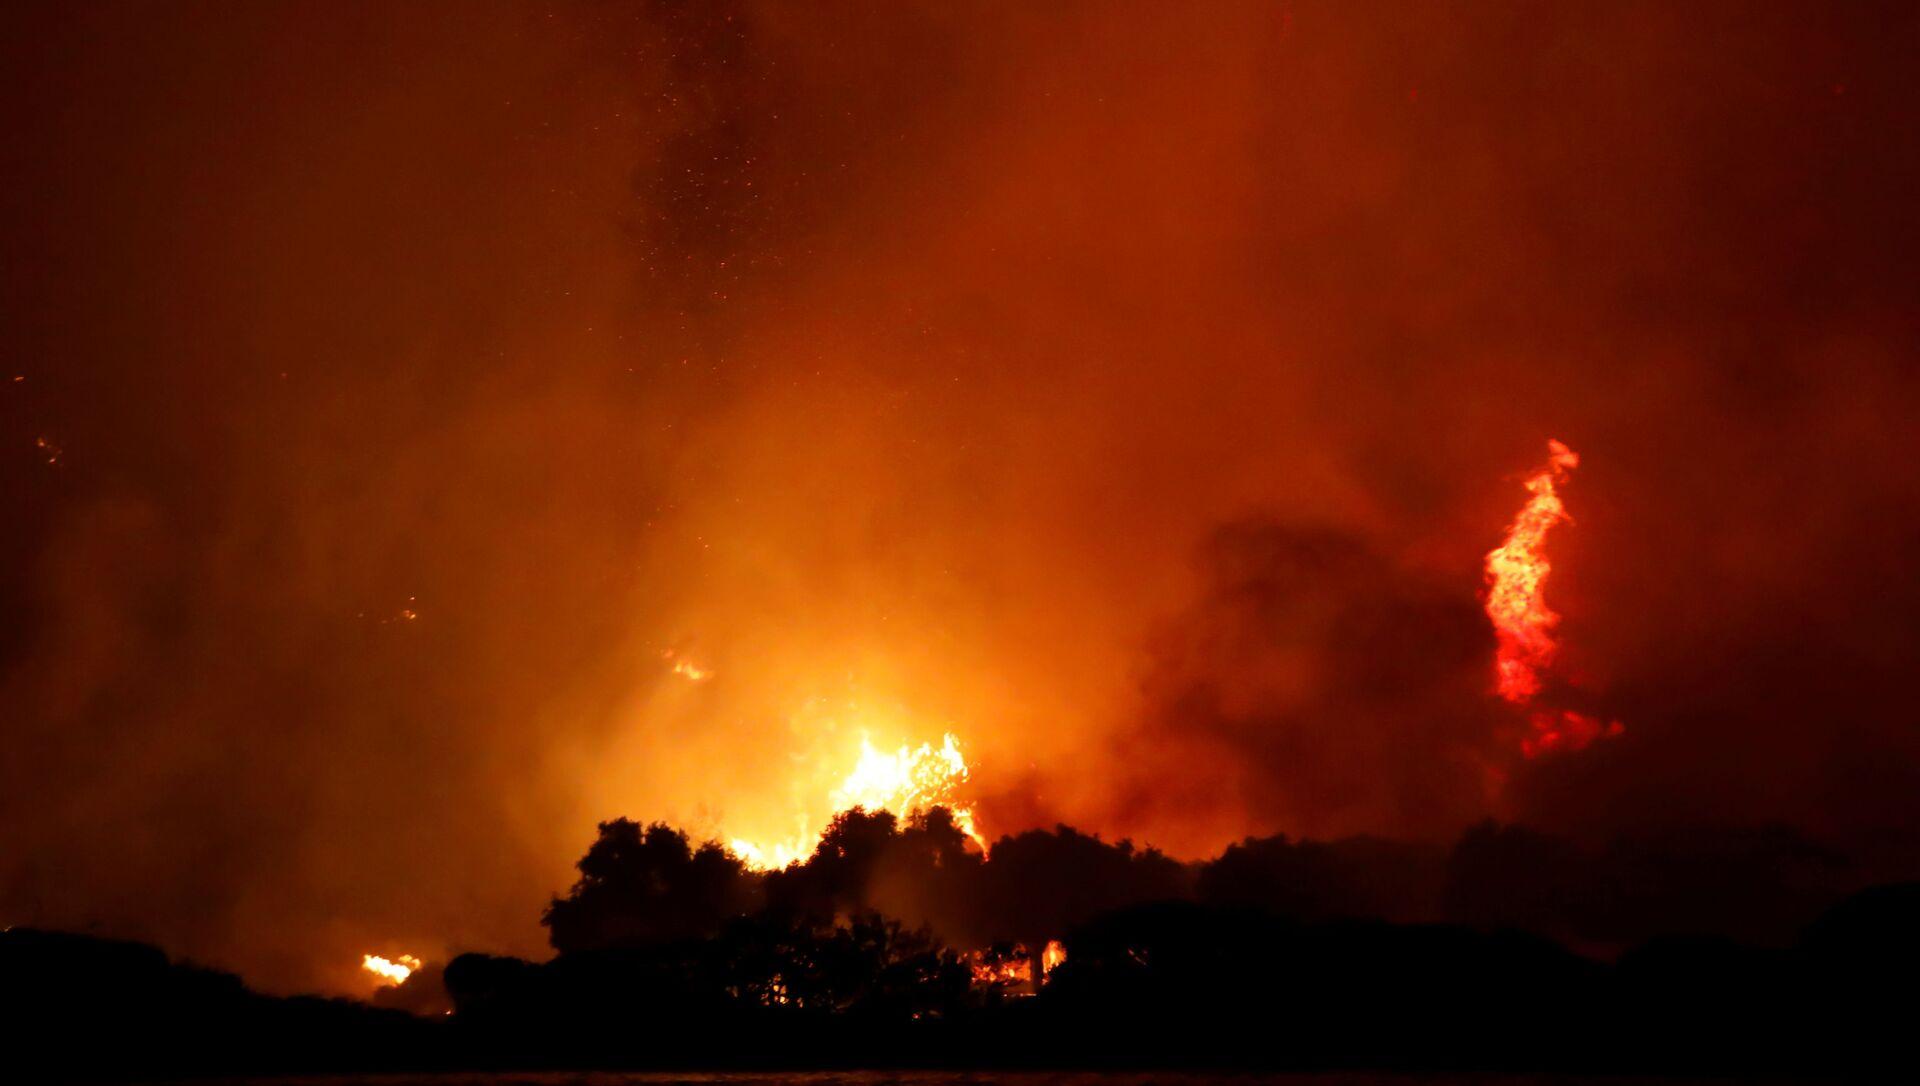 Night sky turns orange as Turkey's wildfires rage on at the shores of Cokertme village near Bodrum, Turkey, August 2, 2021. - Sputnik International, 1920, 04.08.2021